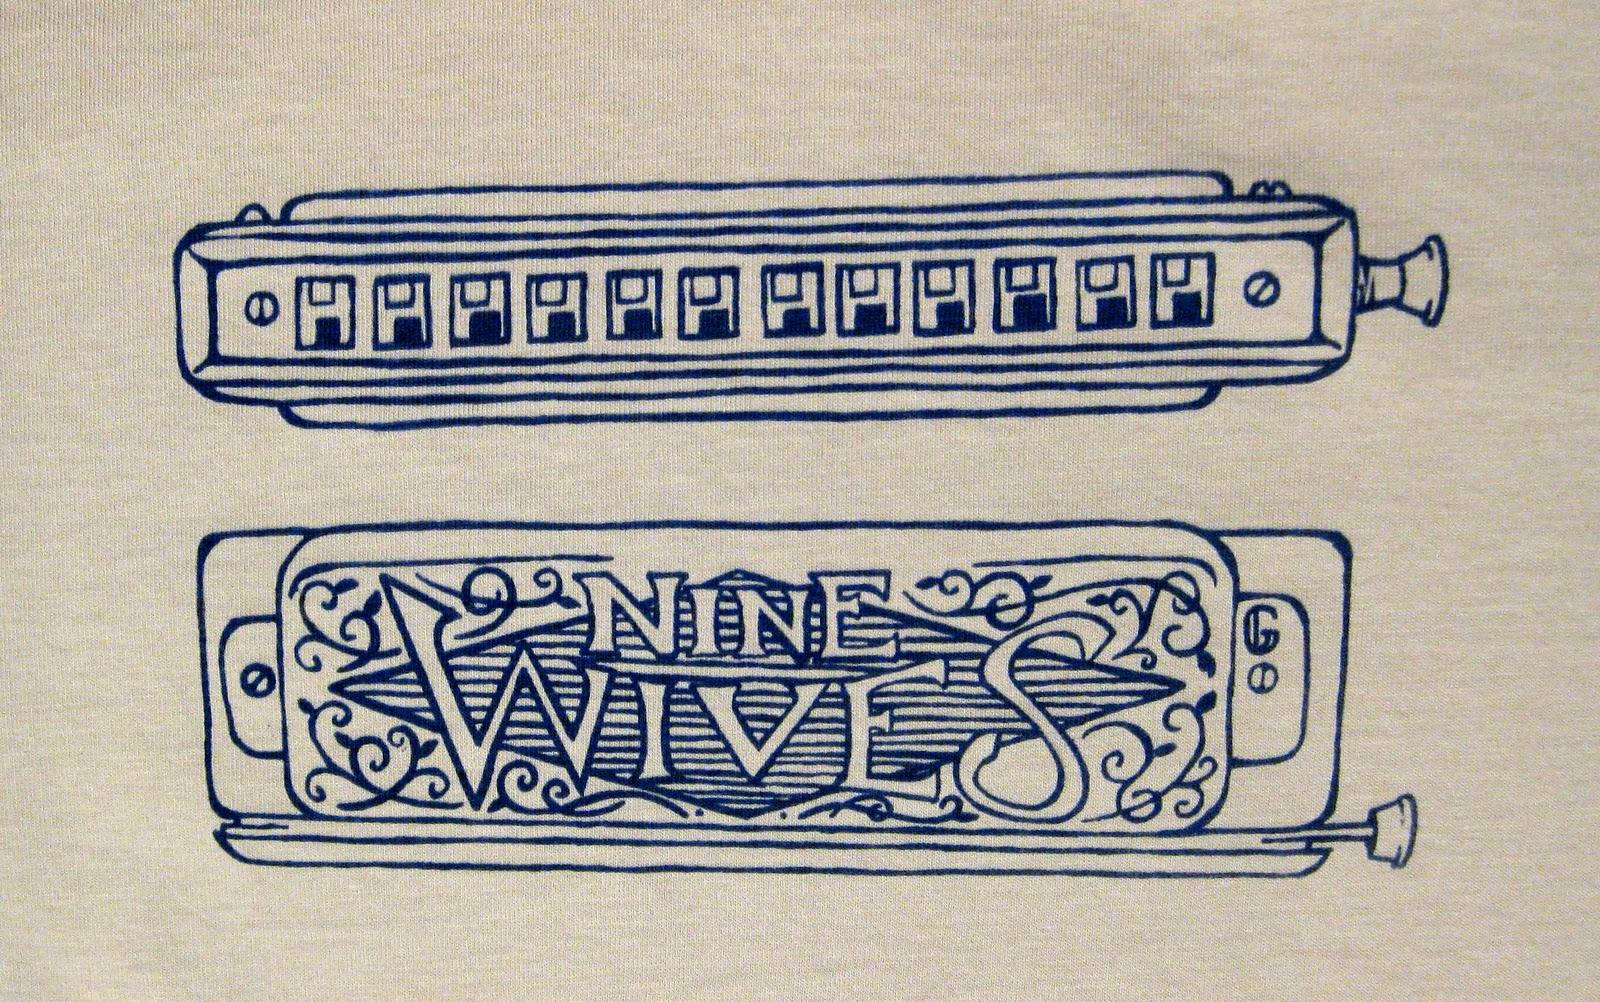 1600x1002 Like Line Work, Embellishments, Font. Harmonica Tattoos